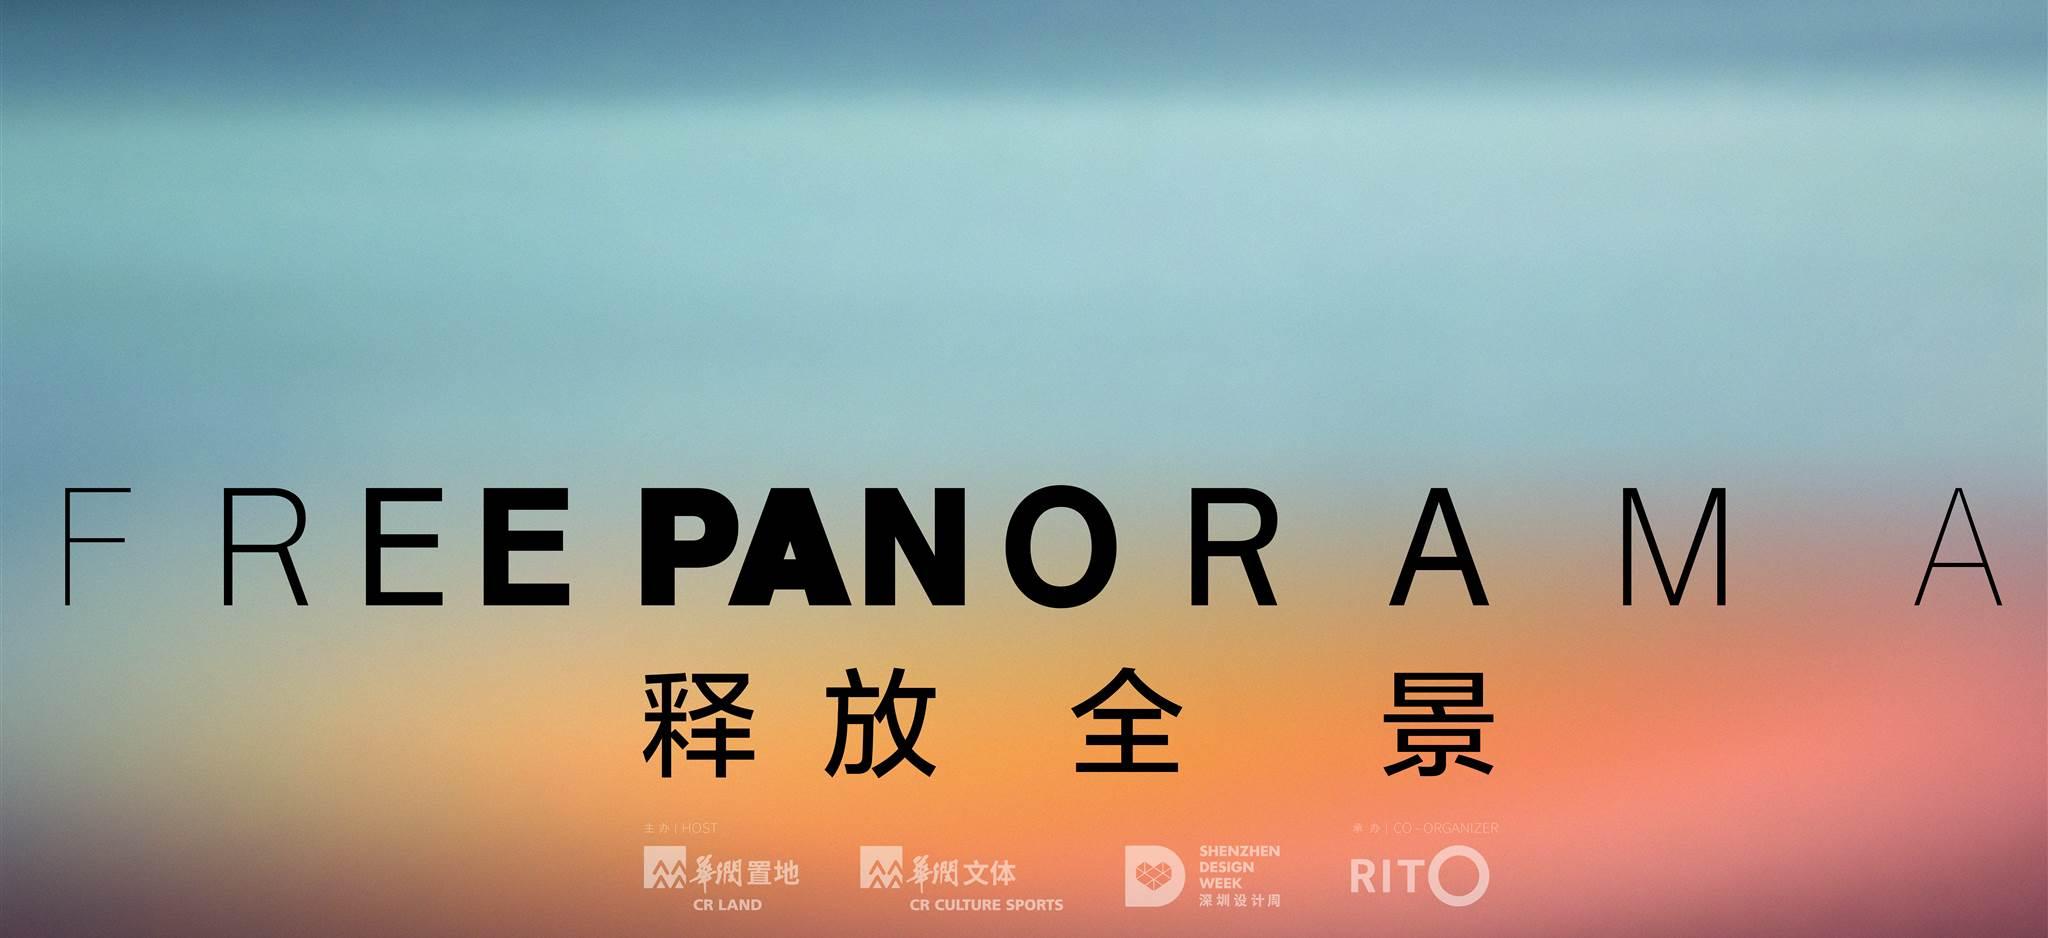 FREE  PANORAMA _ 2019 Shenzhen New Media Art Festival